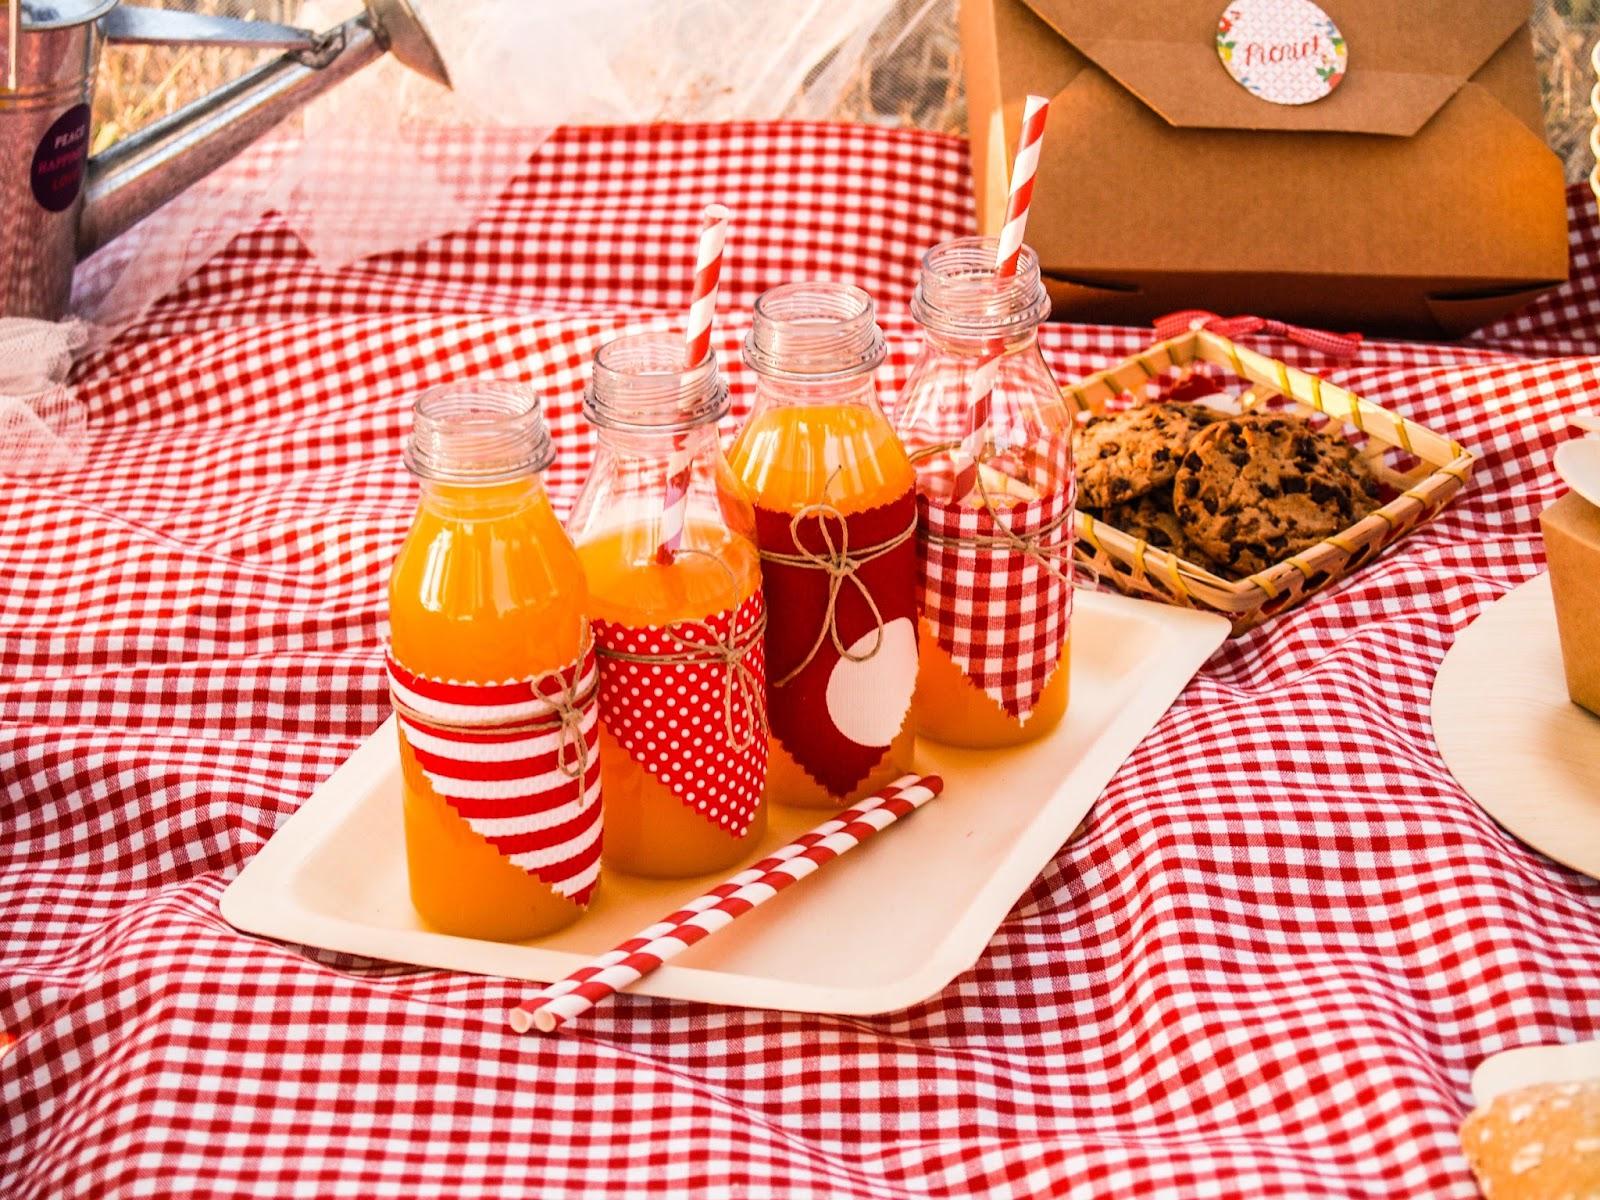 Kit de picnic sorteo blog cocott - Platos para picnic ...